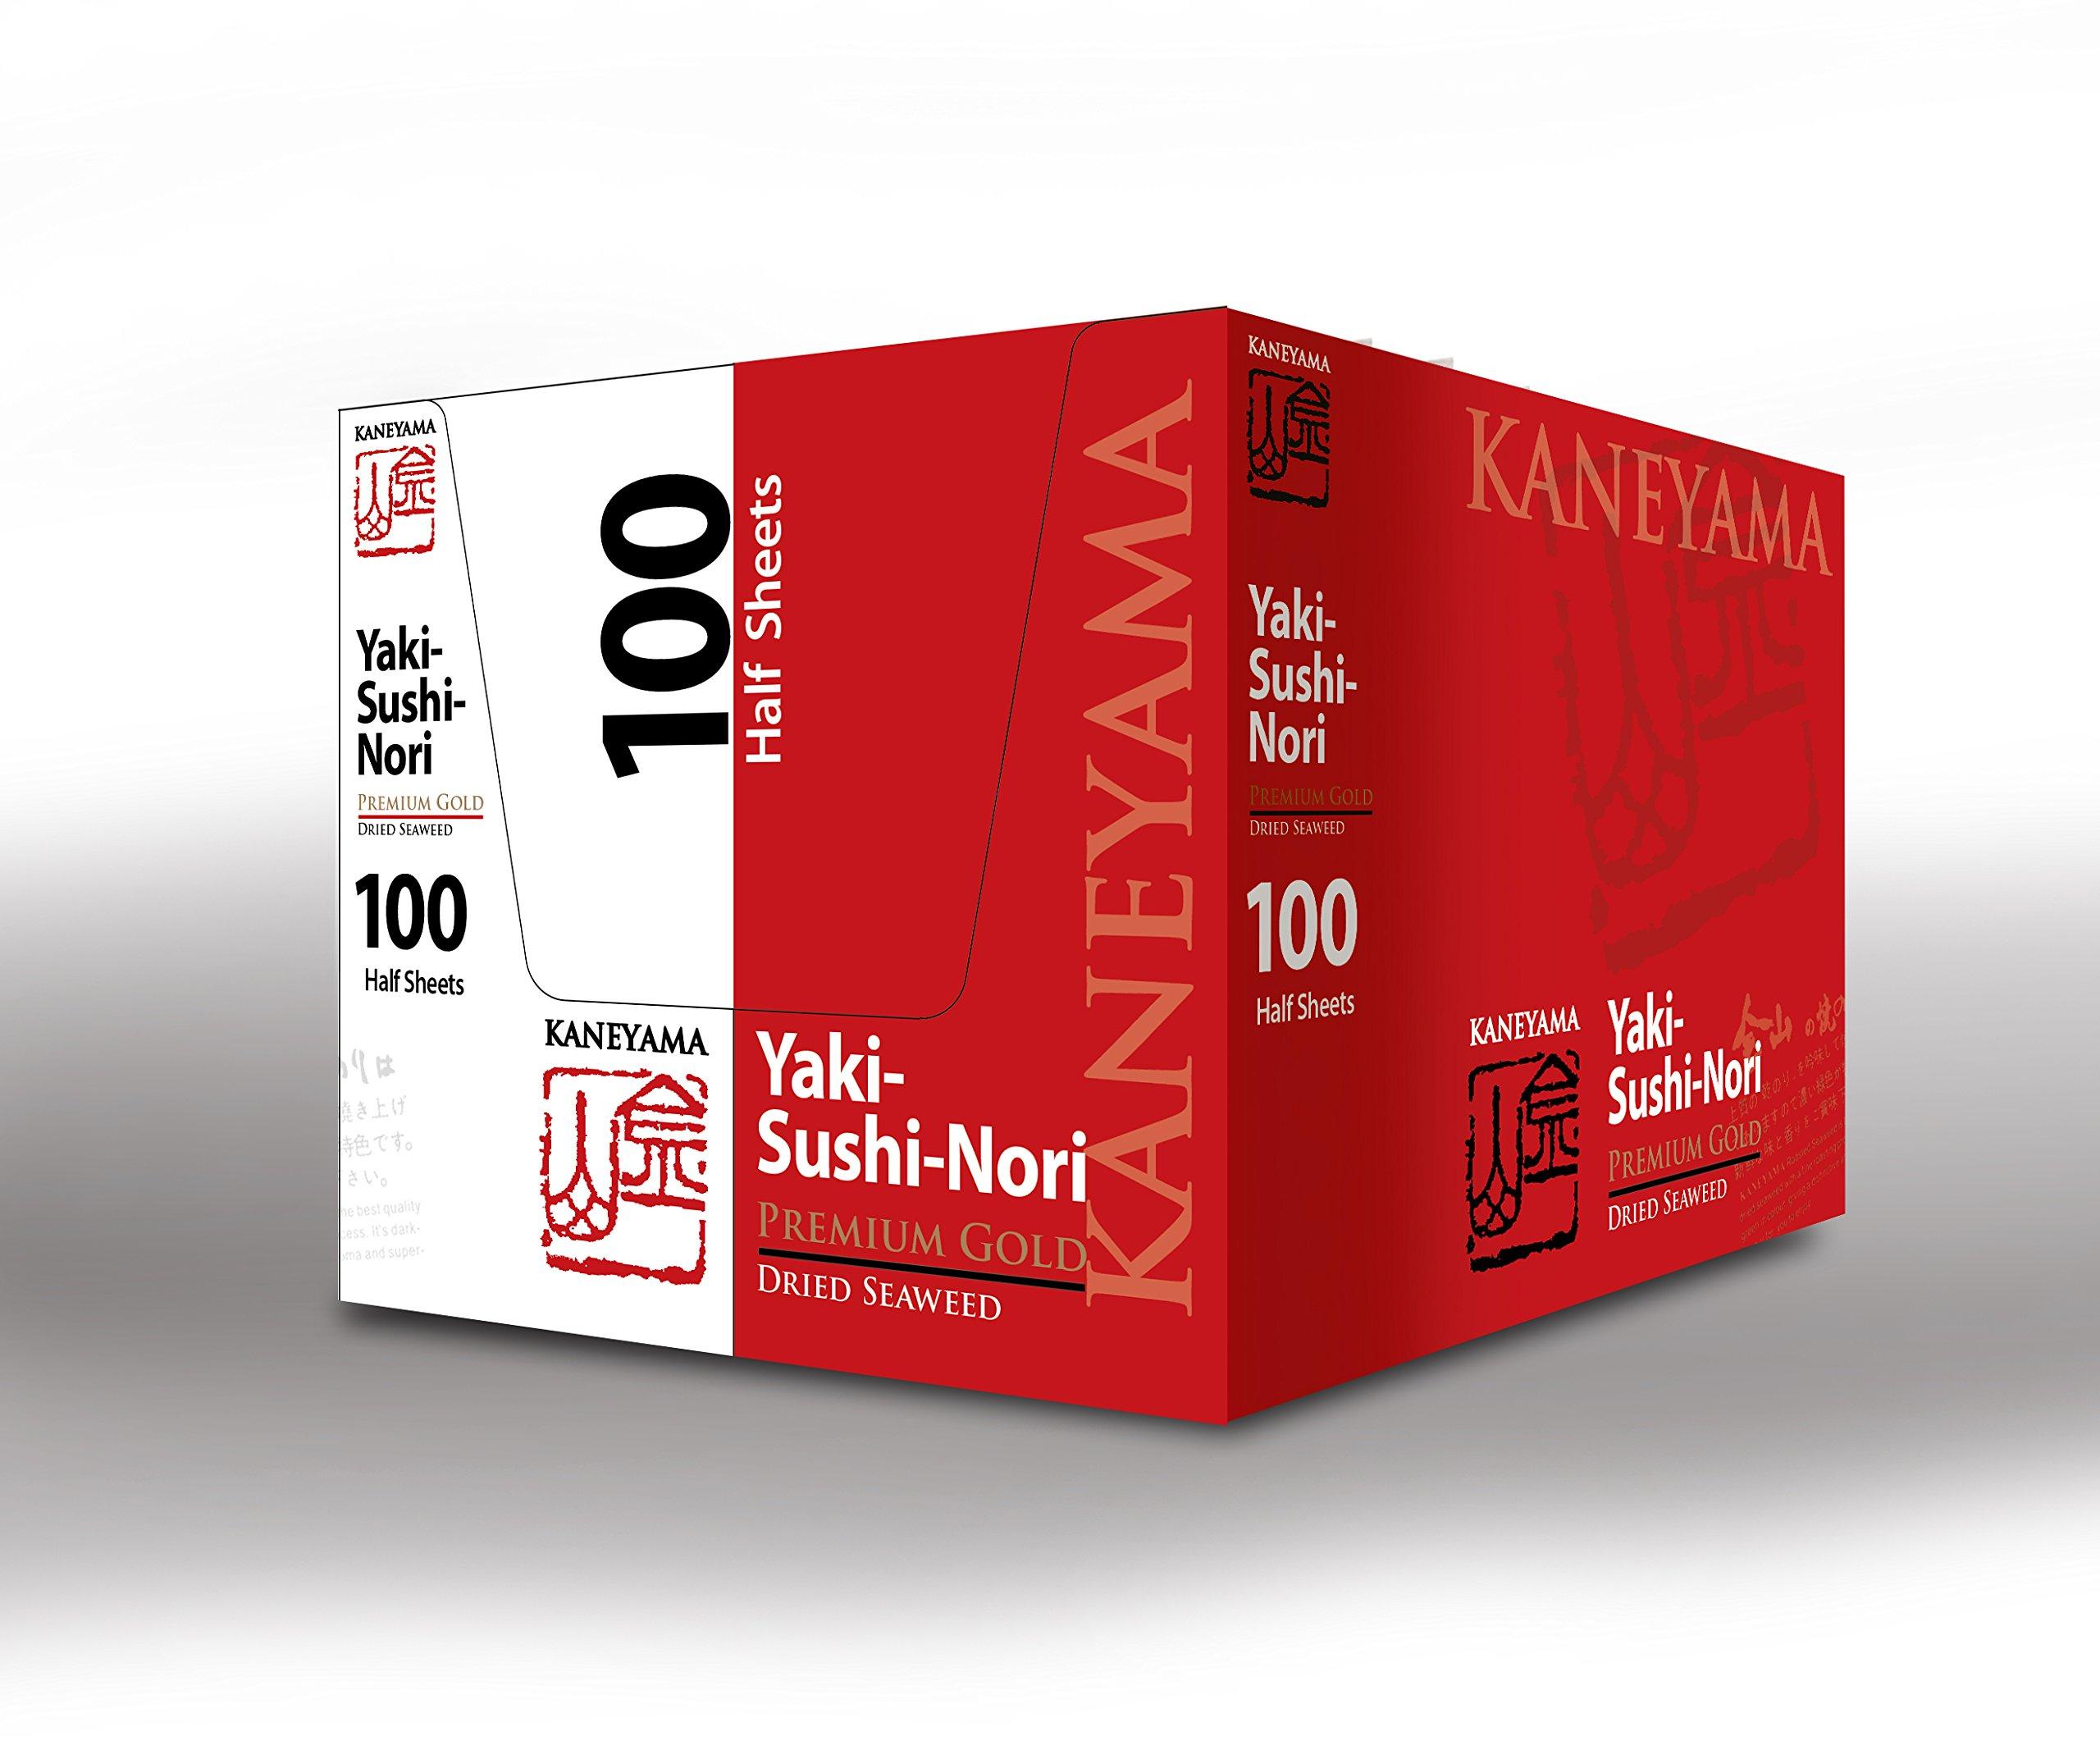 Kaneyama Yaki Sushi Nori / Dried Seaweed (Vacuum-packed/re-sealable), Premium Gold Grade (Half Size 100 Sheets 10 Packs) by Kaneyama (Image #5)